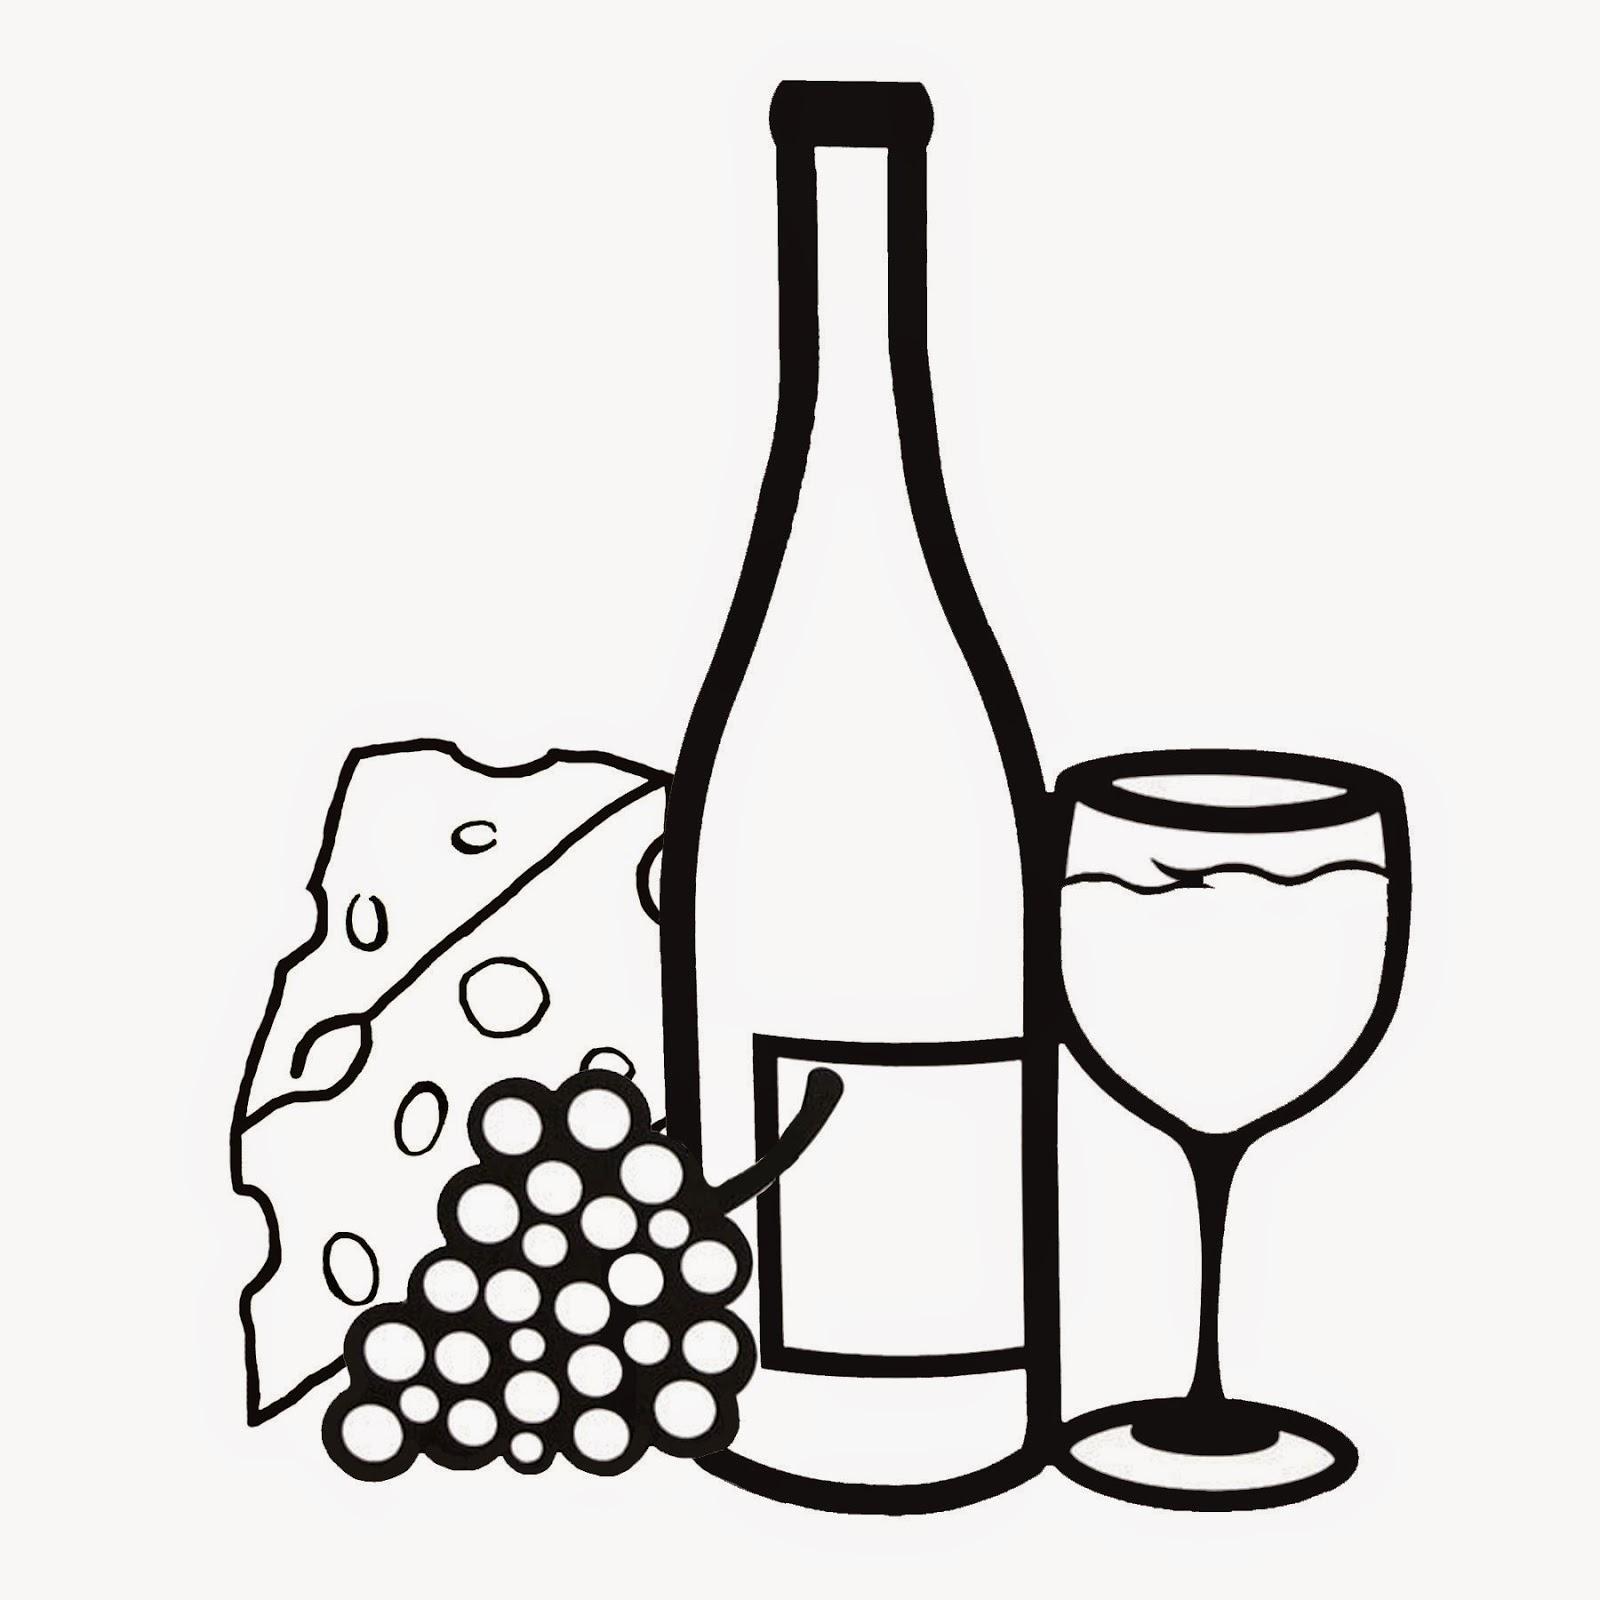 1600x1600 Bottle Of Wine Drawing